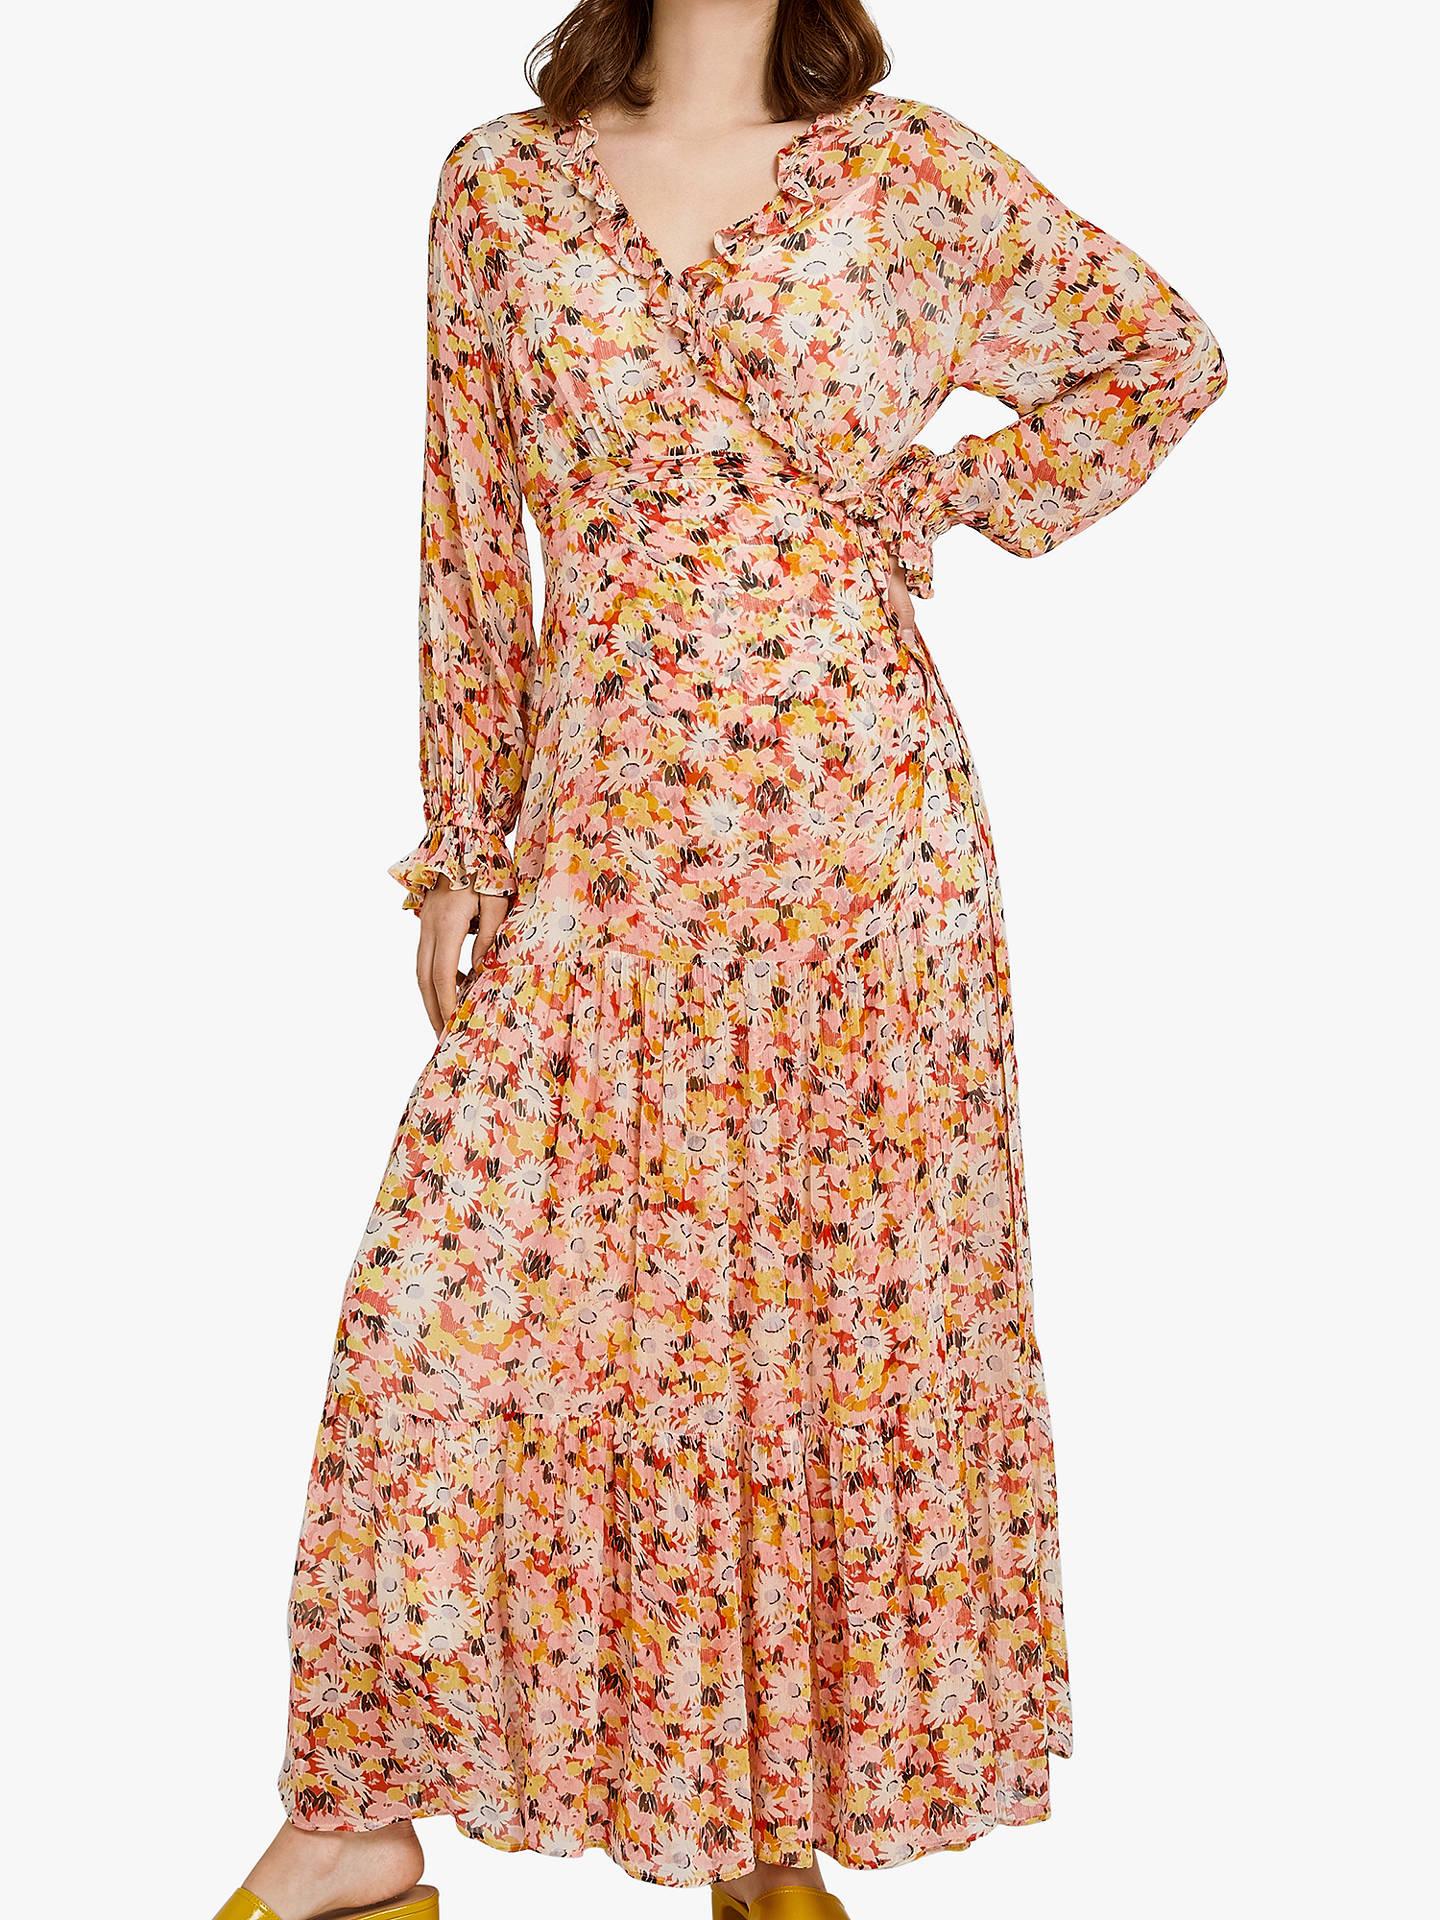 ffe506fa3296 Buy Ghost Jasmine Wrap Dress, Retro Floral, XS Online at johnlewis.com ...